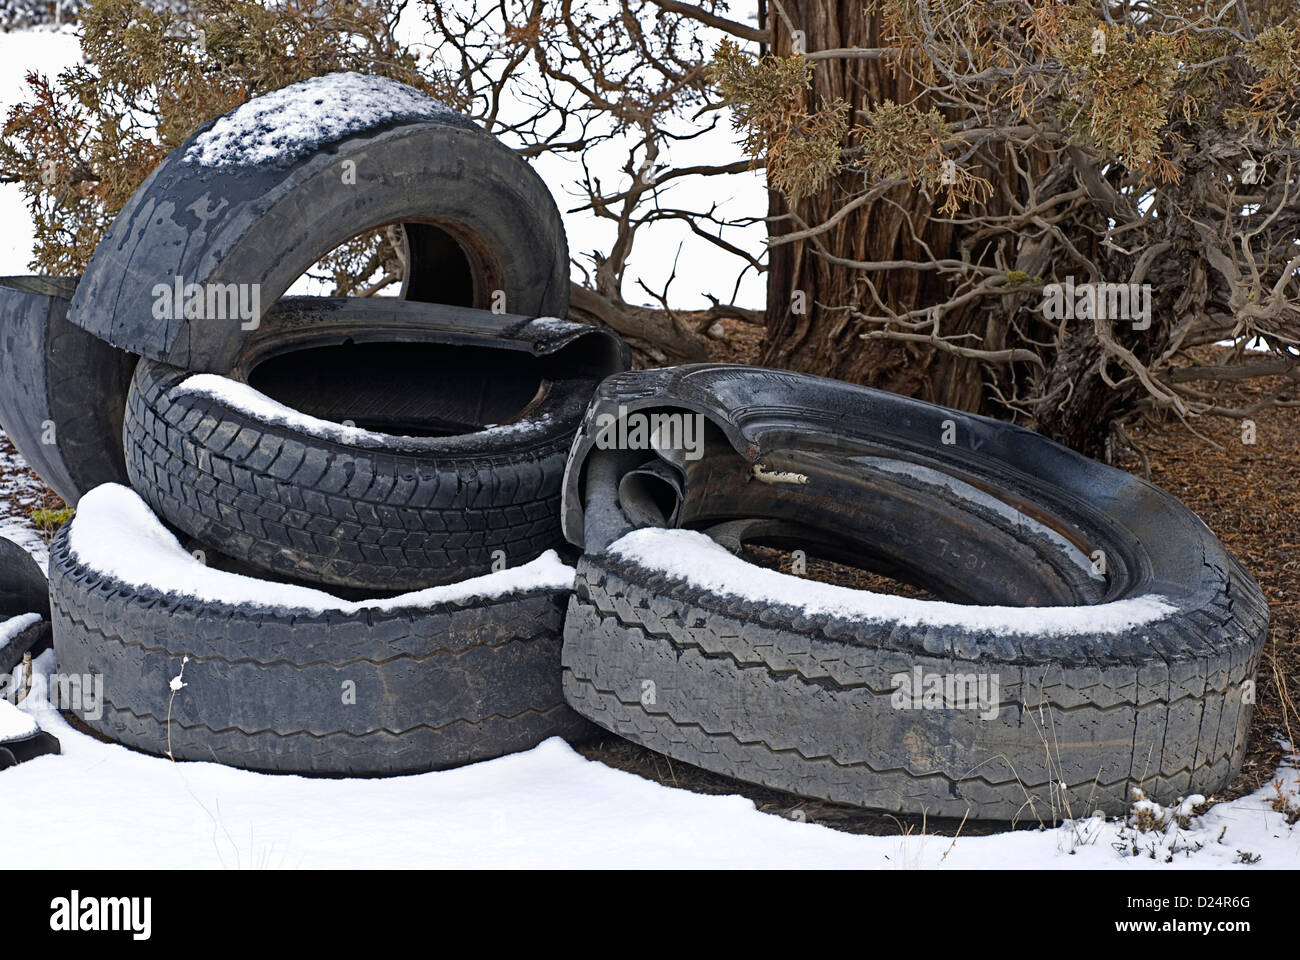 A pile of destroyed tires dumped on public lands, littering the landscape. - Stock Image